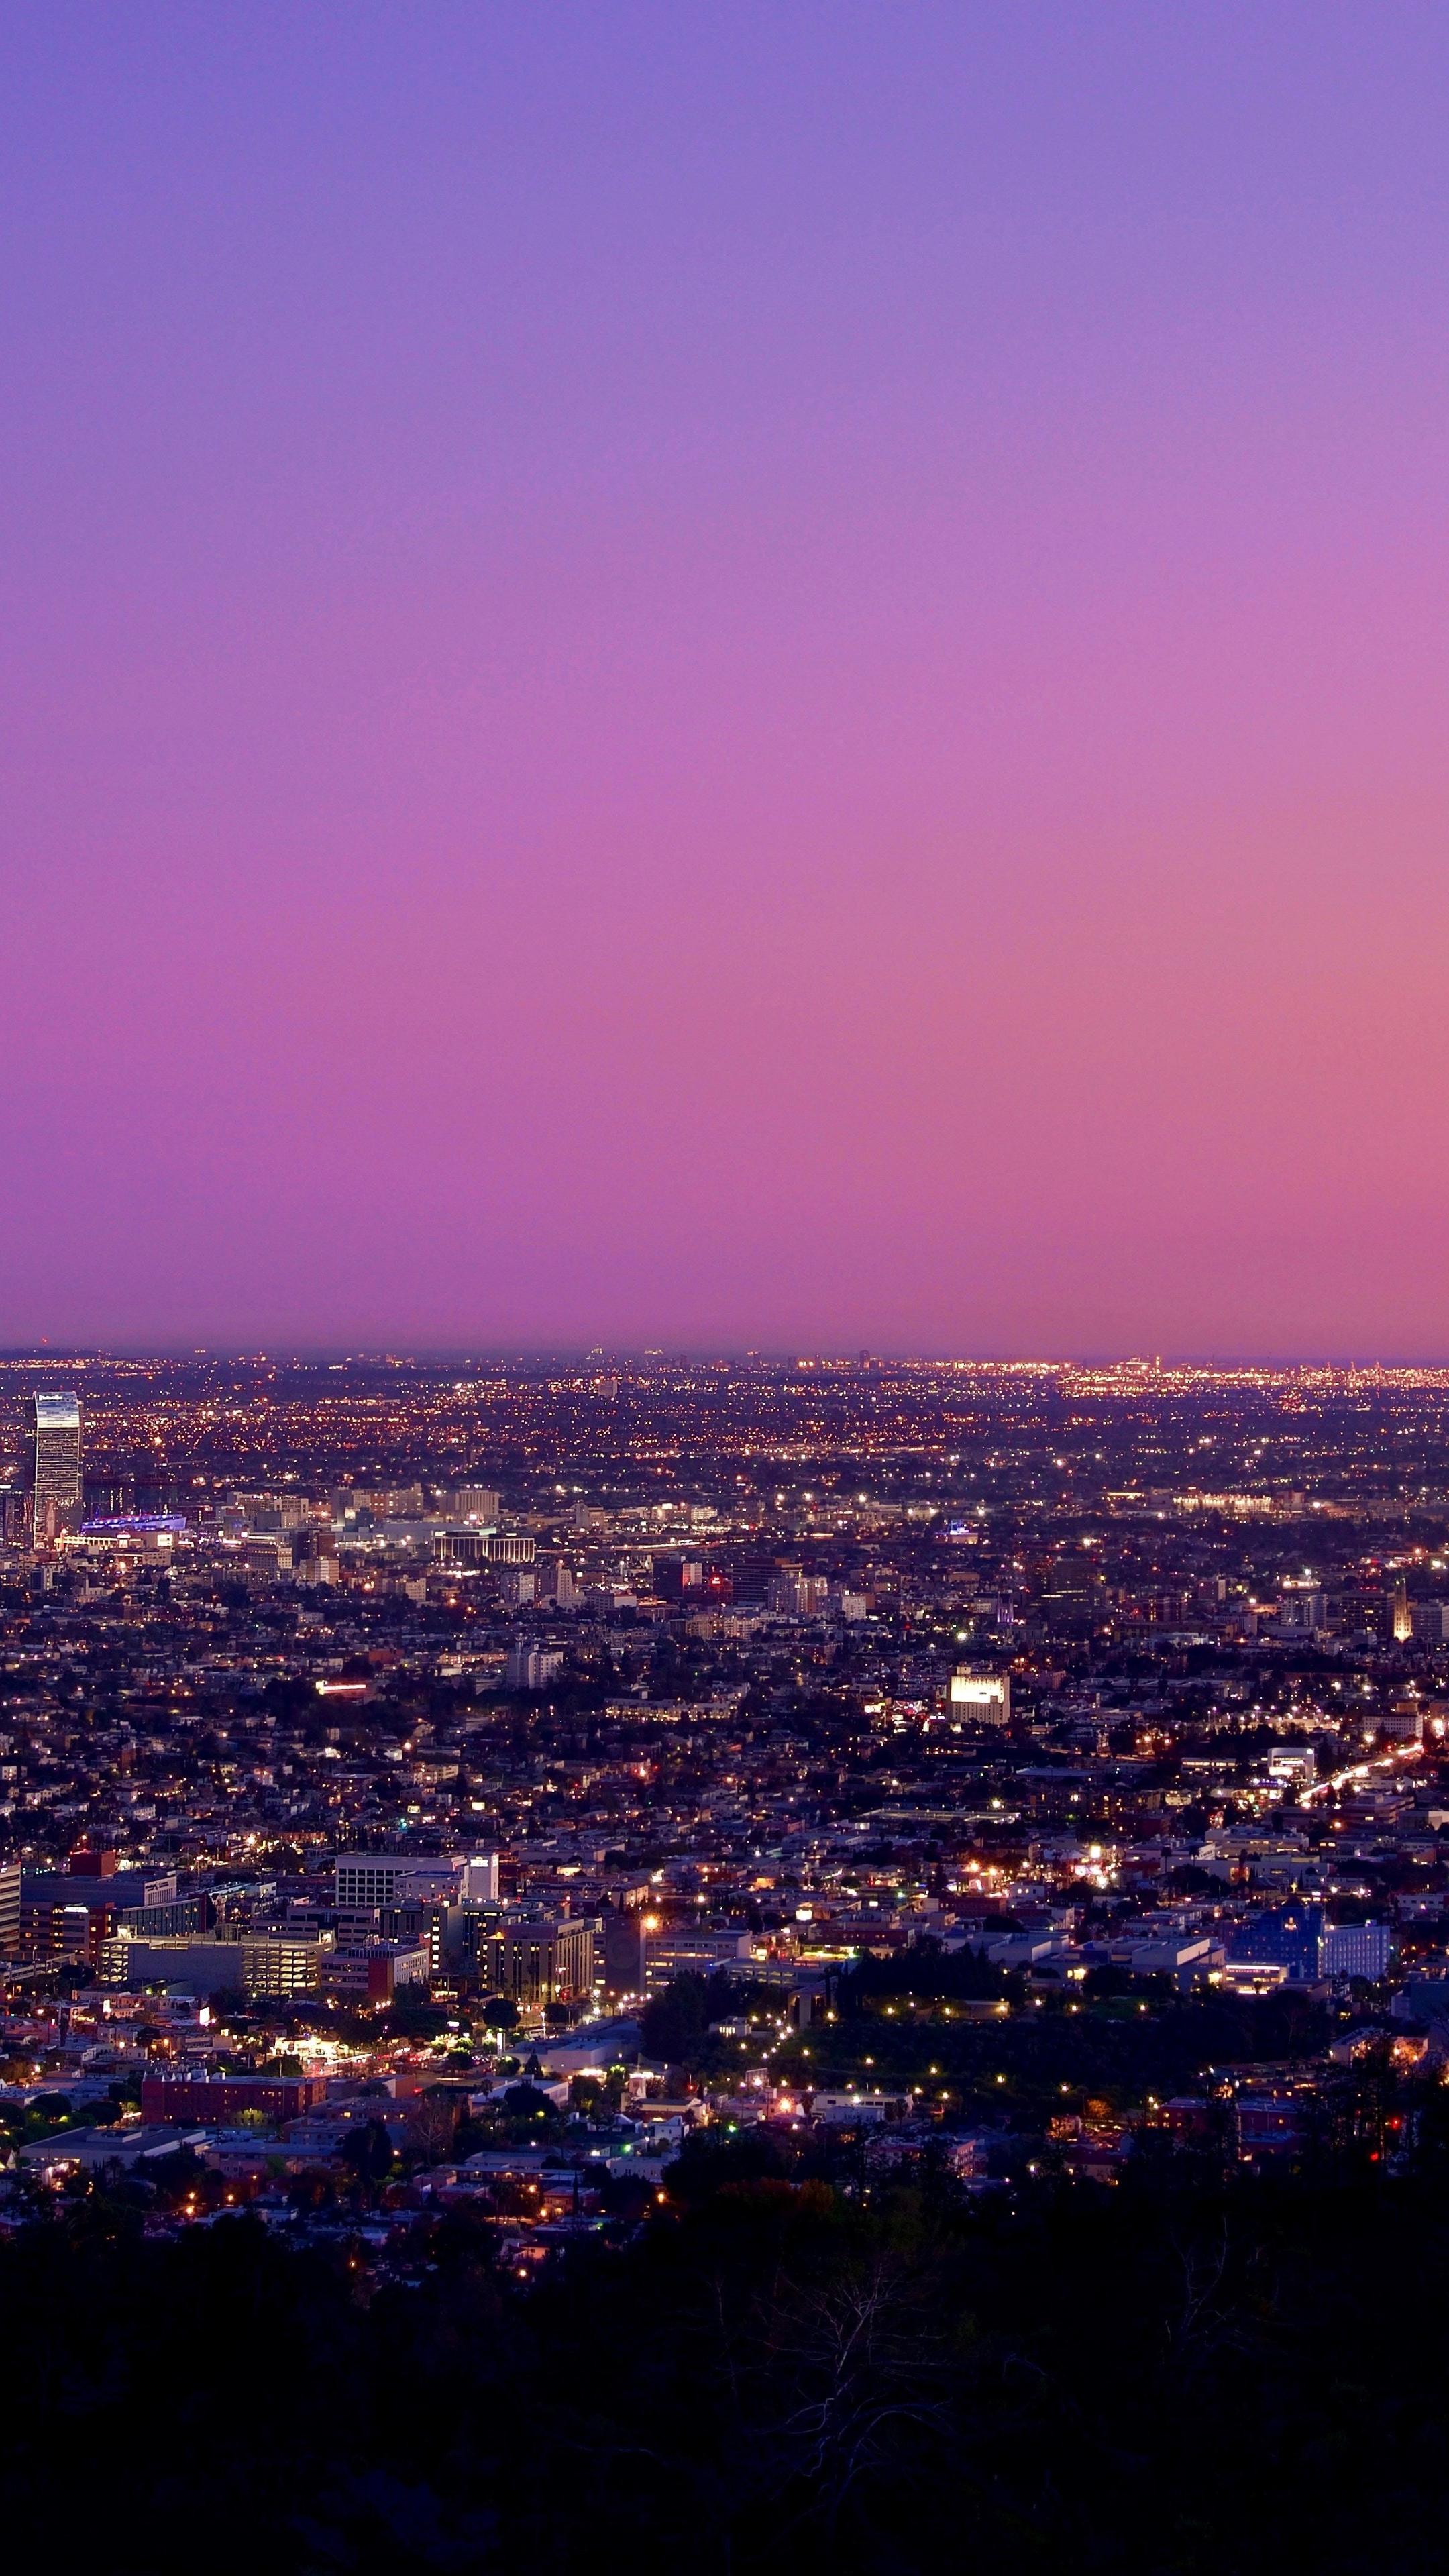 2160x3840 Los Angeles At Night Pink Sky Sony Xperia X,XZ